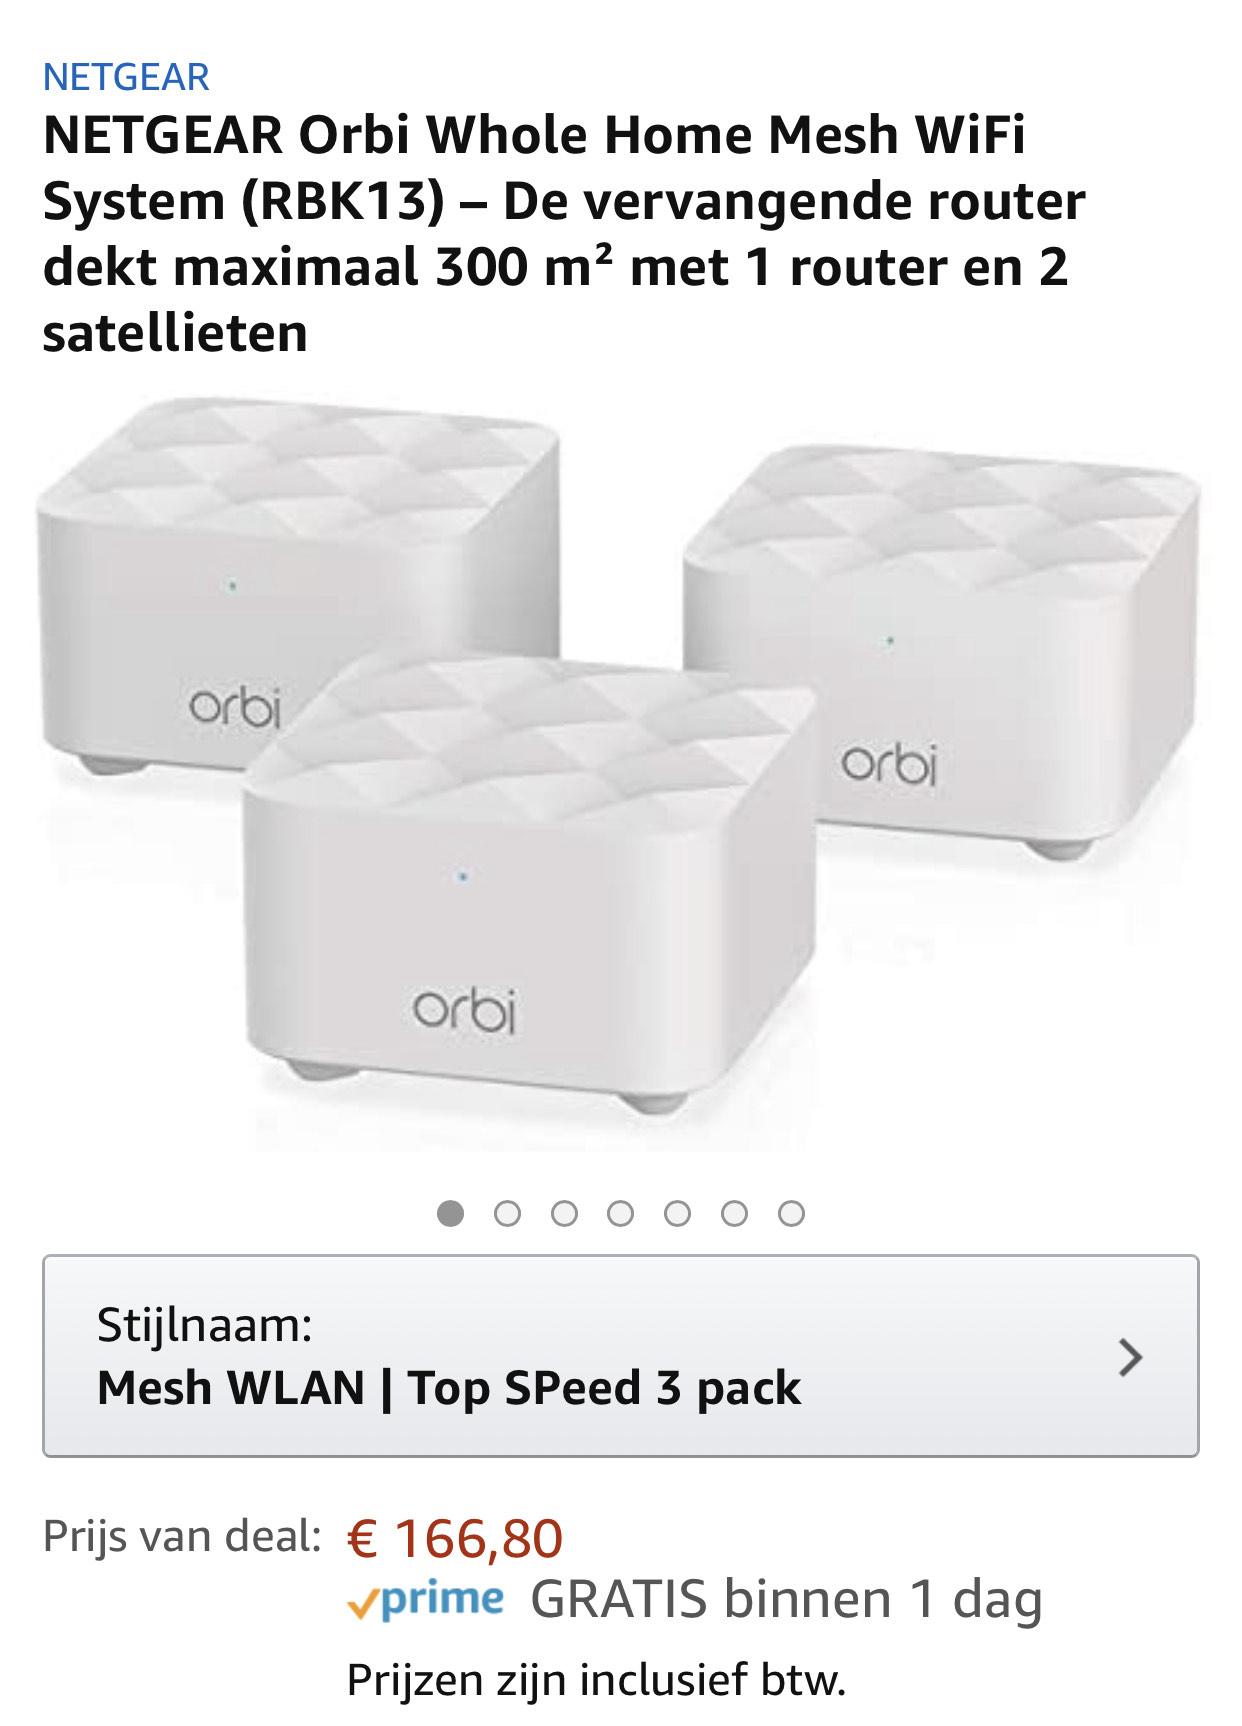 NETGEAR Orbi Whole Home Mesh WiFi System (RBK13) – 3 pack